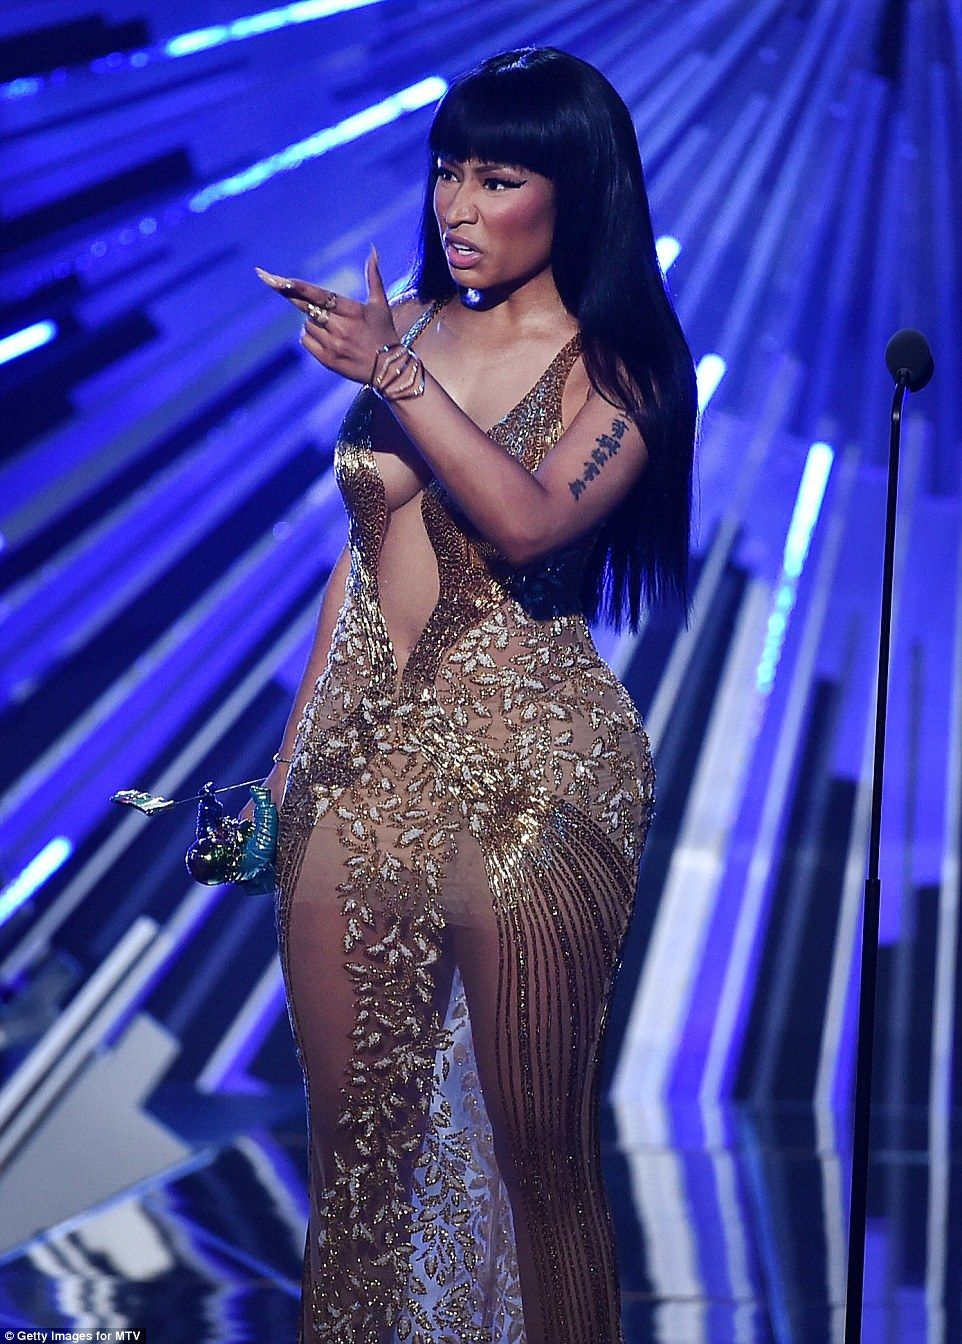 Nicki Minaj Calls Host Miley A B As Taylor Dominates Mtv Vmas Nicki Minaj Miley Cyrus Old Nicki Minaj Nicki Minaj